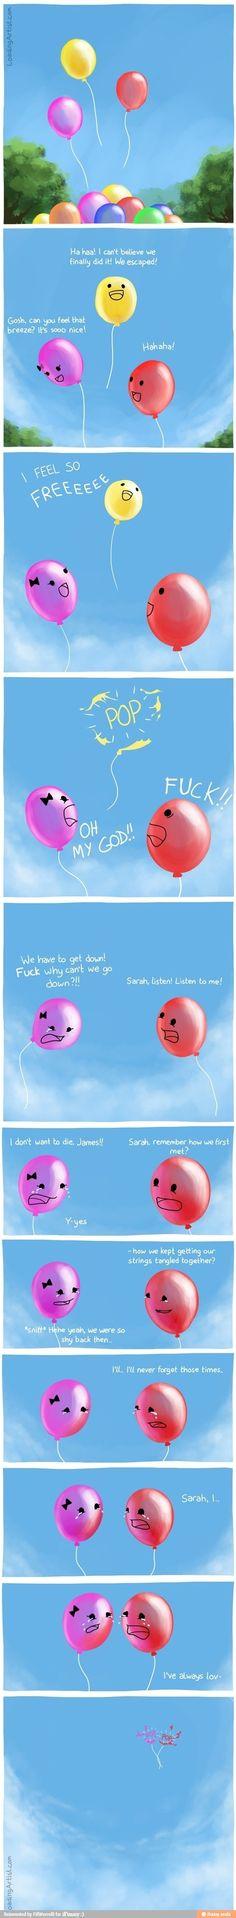 Balloon love story